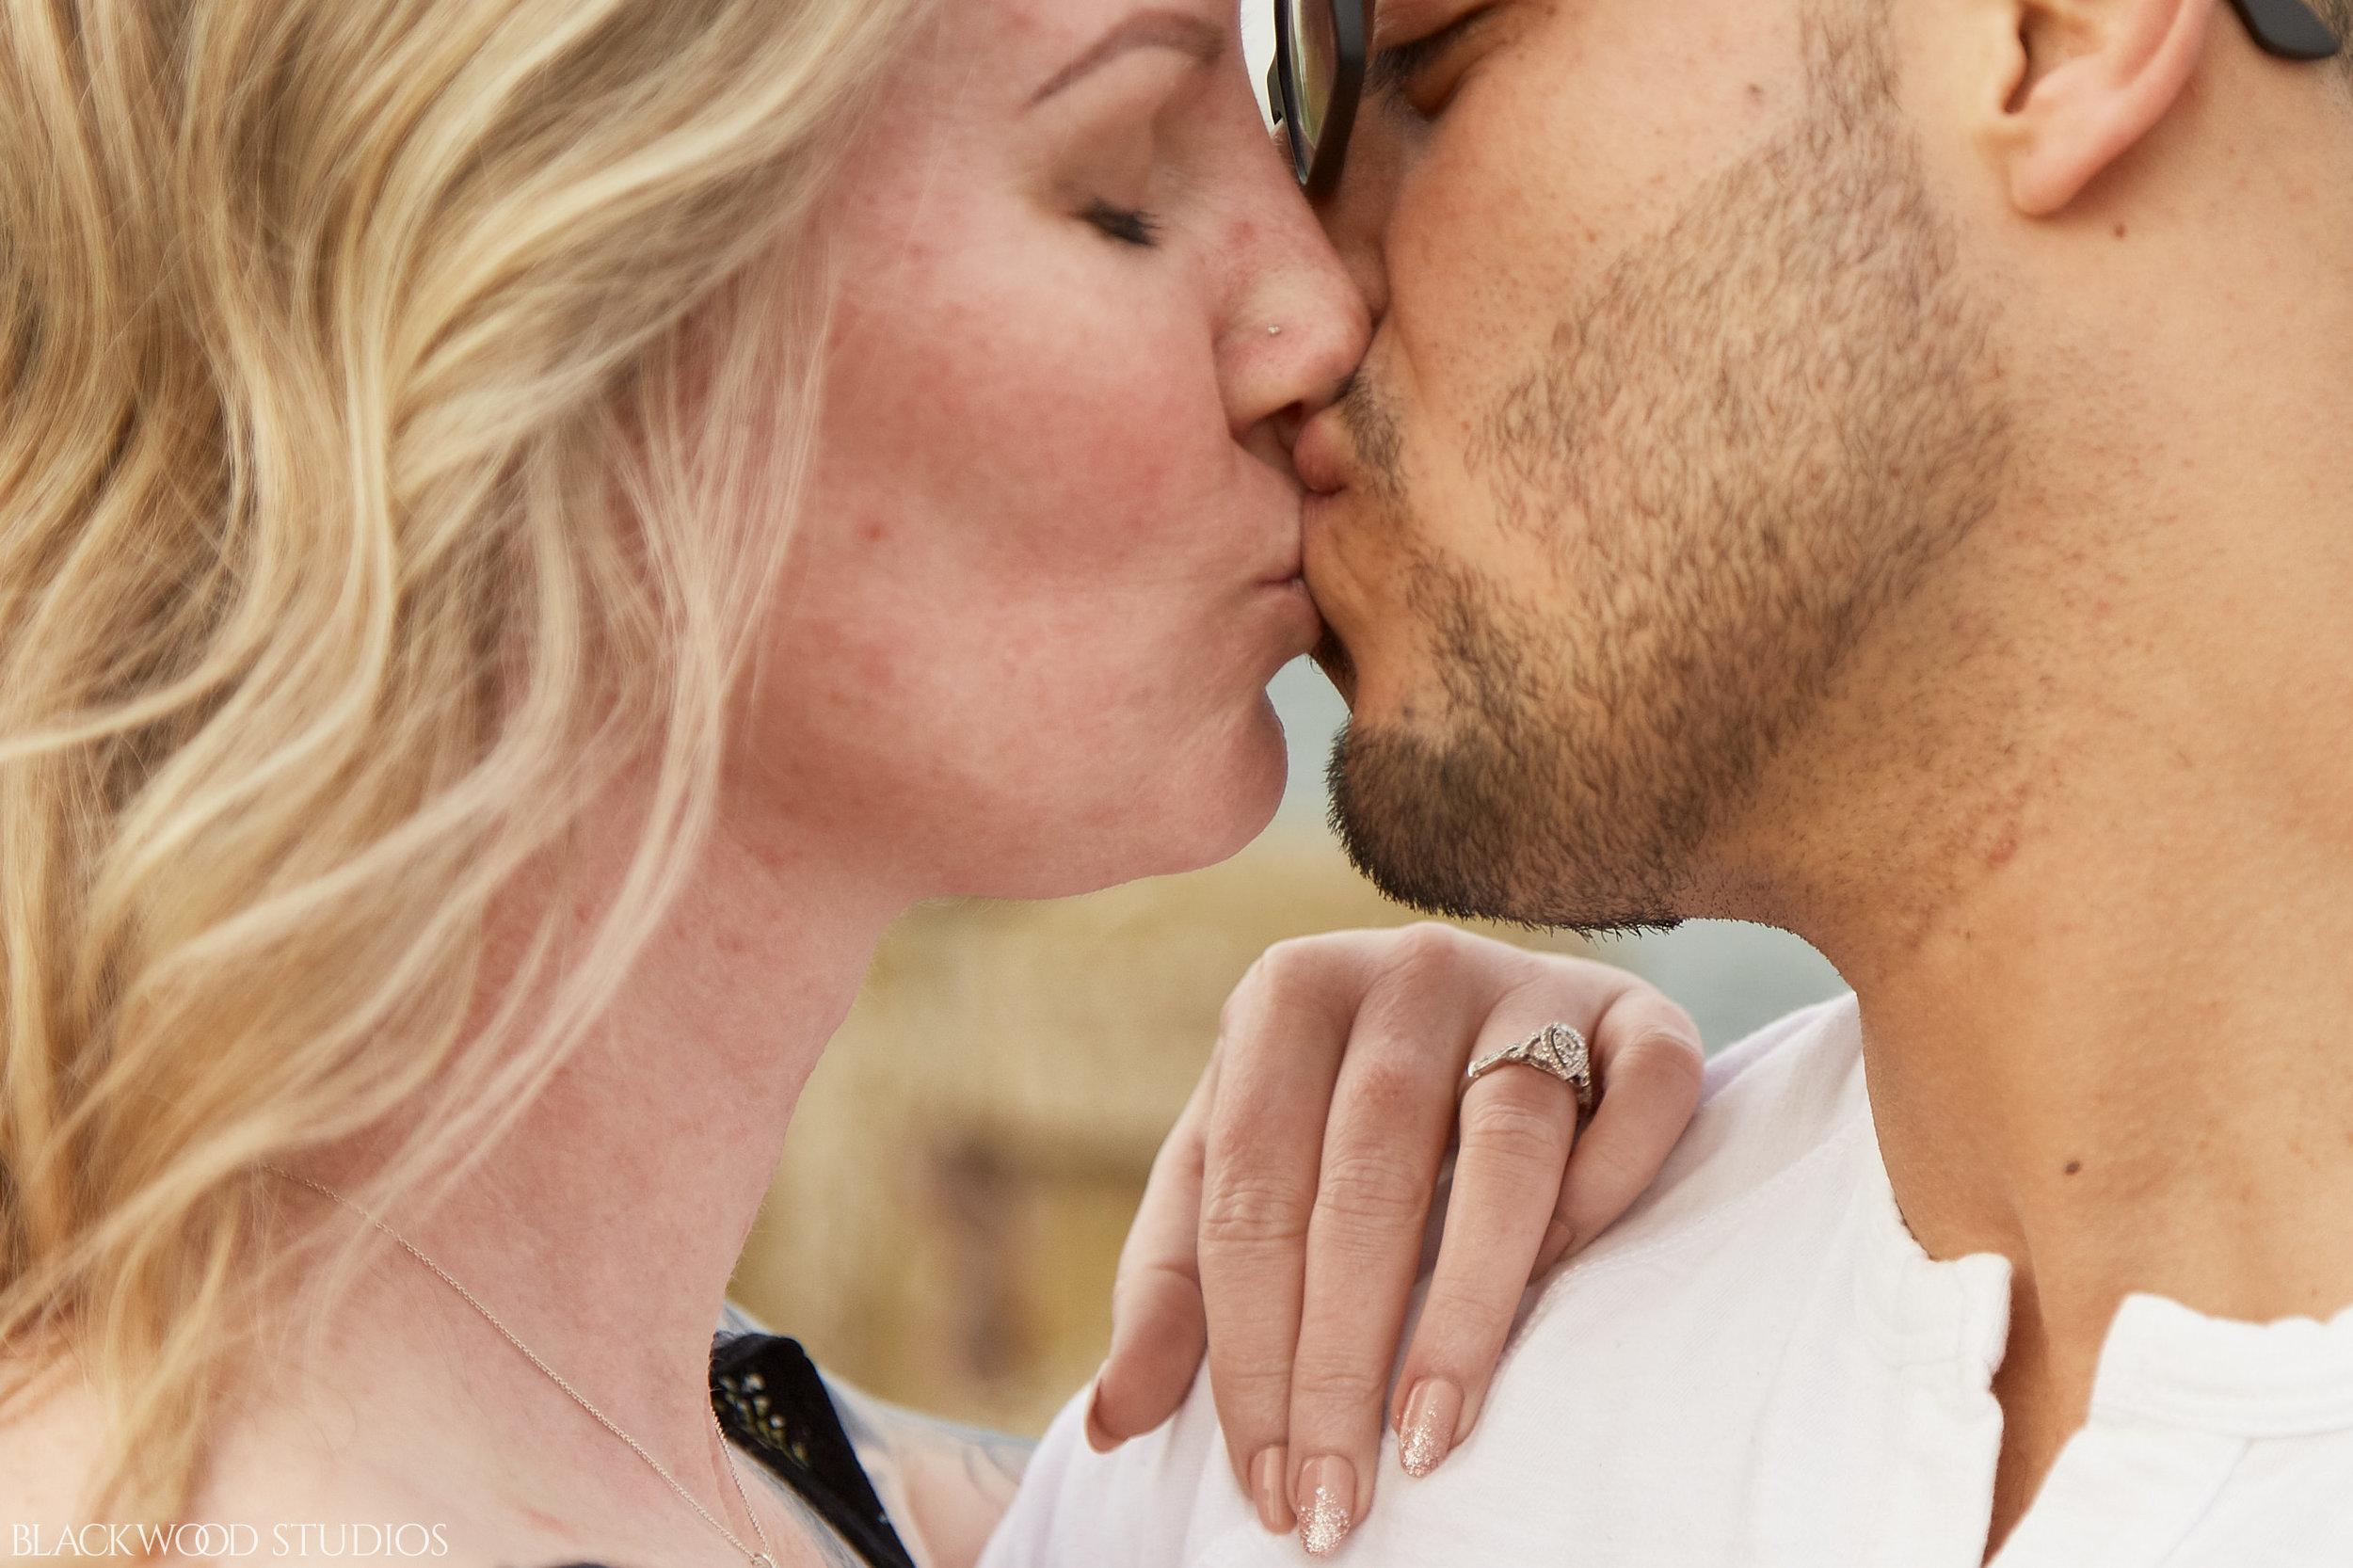 Blackwood-Studios-Photography-20190604194501-Shannon-and-Pedro-Engagement-Spencer-Smith-Park-Burlington-Ontario-Canada.jpg